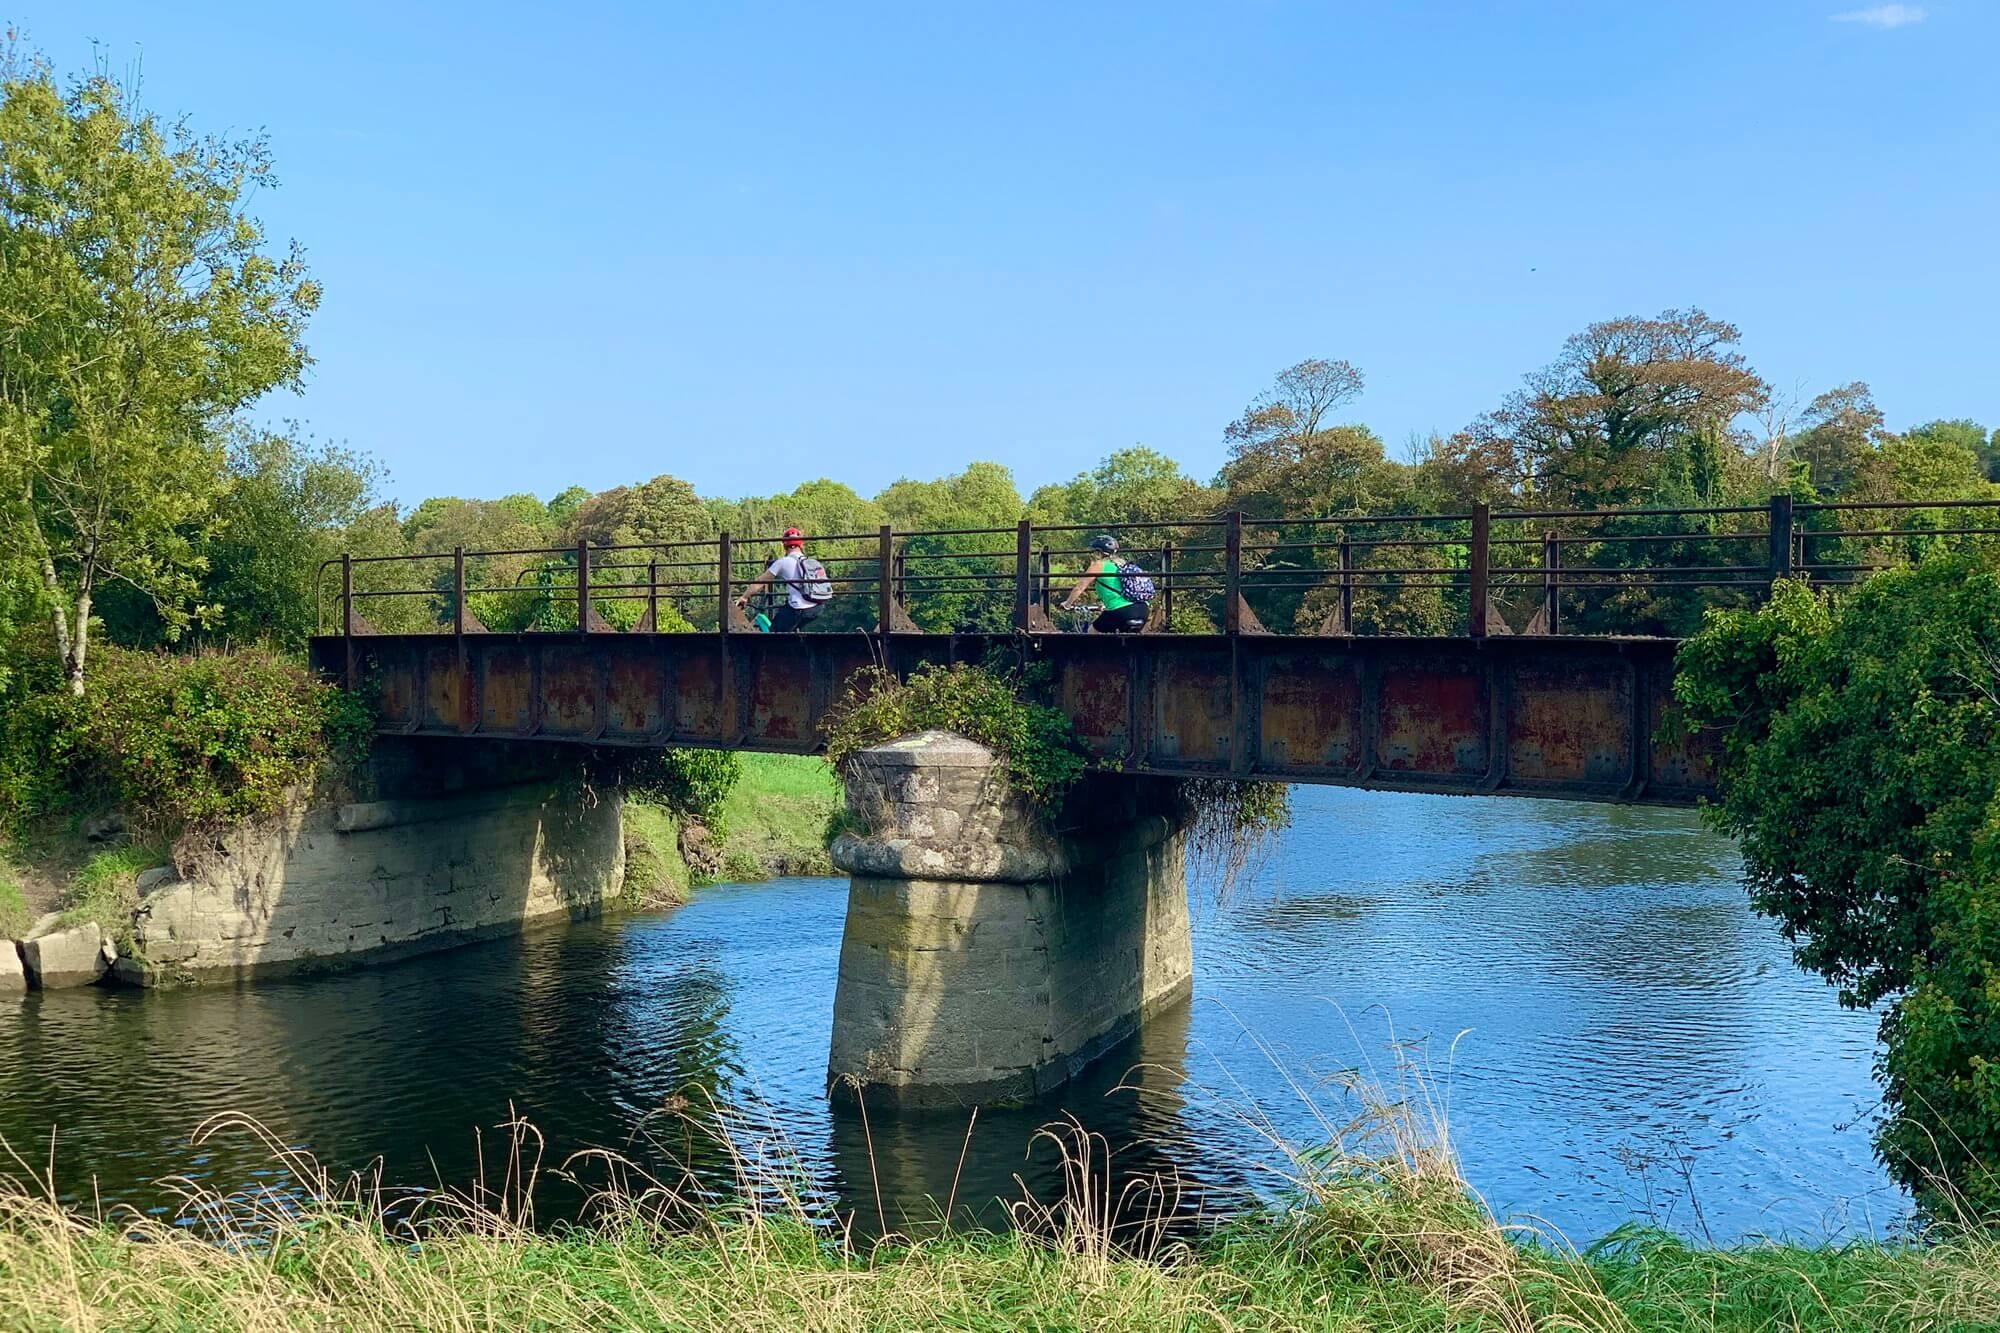 Grogley Halt to Wadebridge